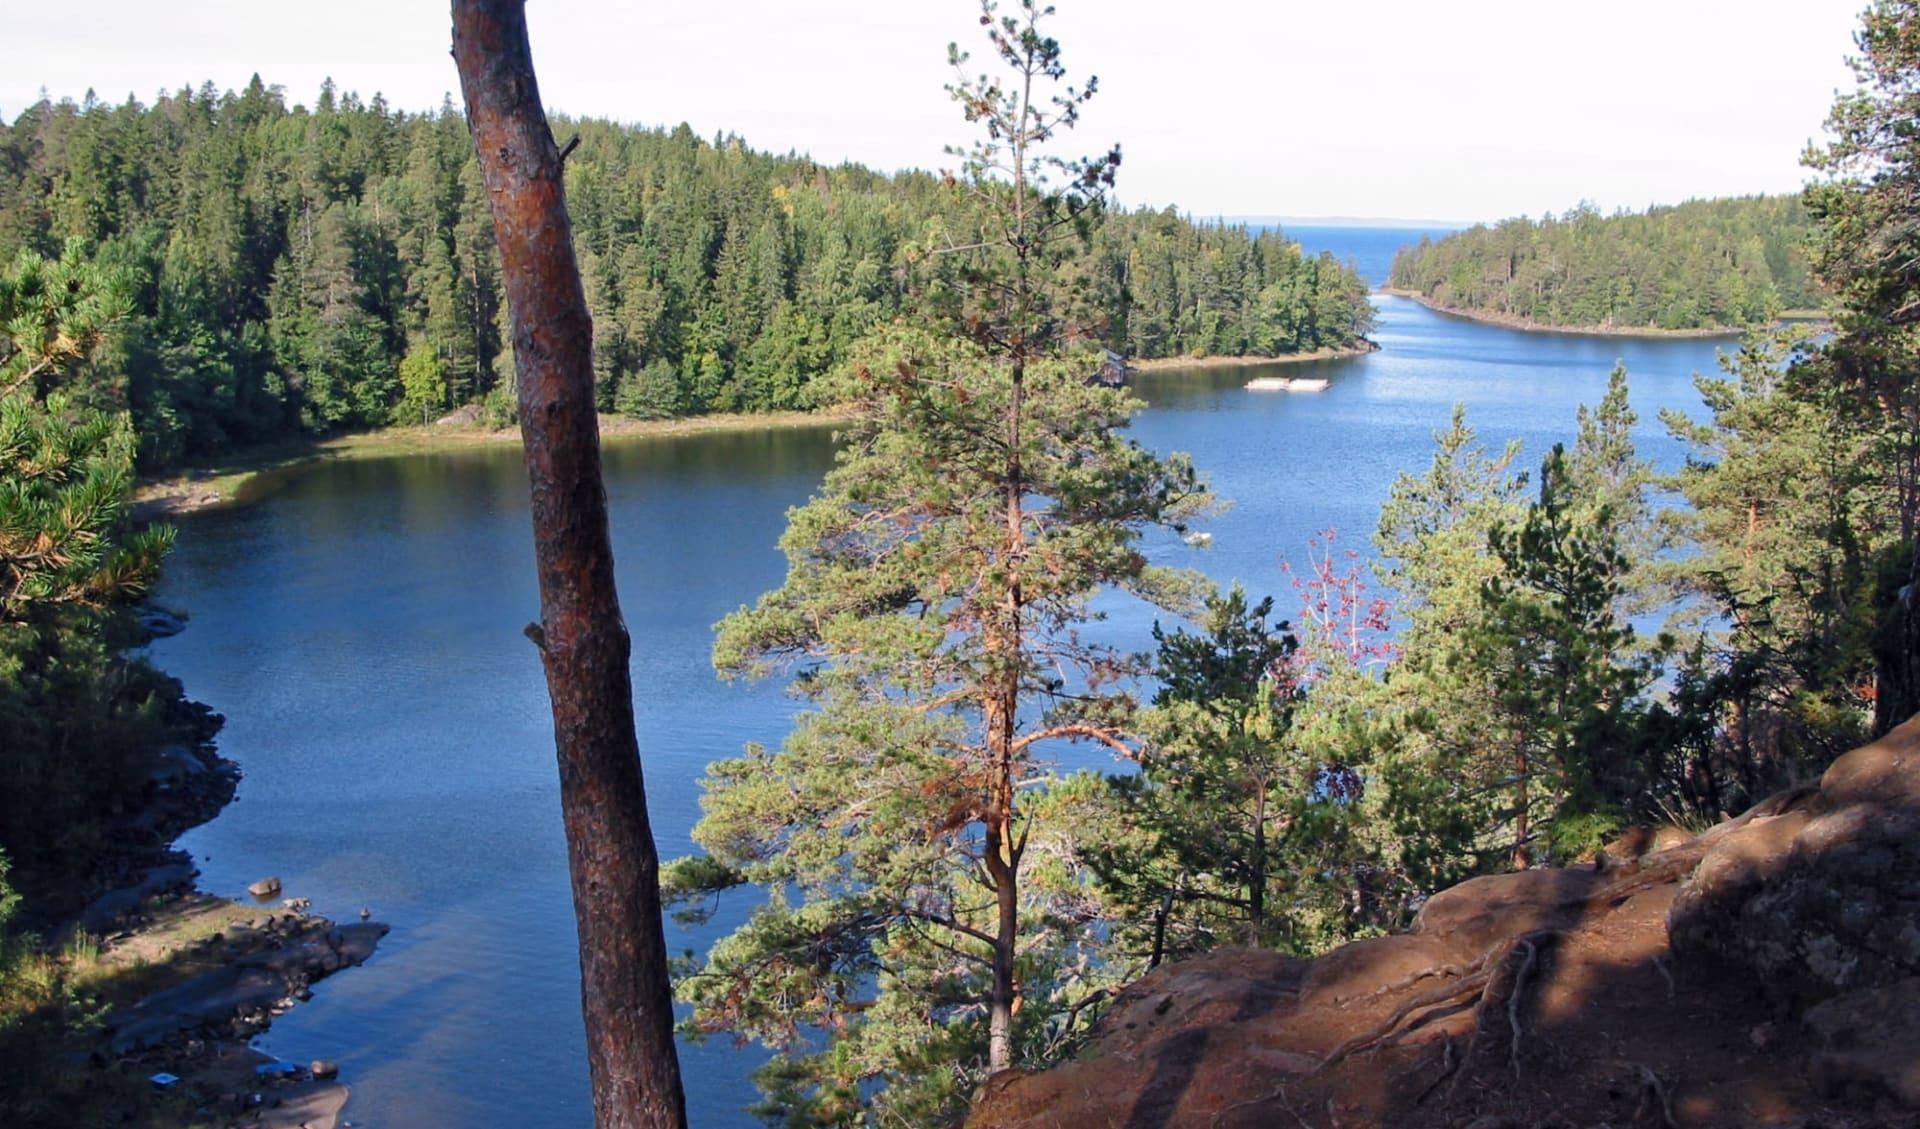 Bezauberndes Karelien ab St. Petersburg: Russland - Karelien - Fluss